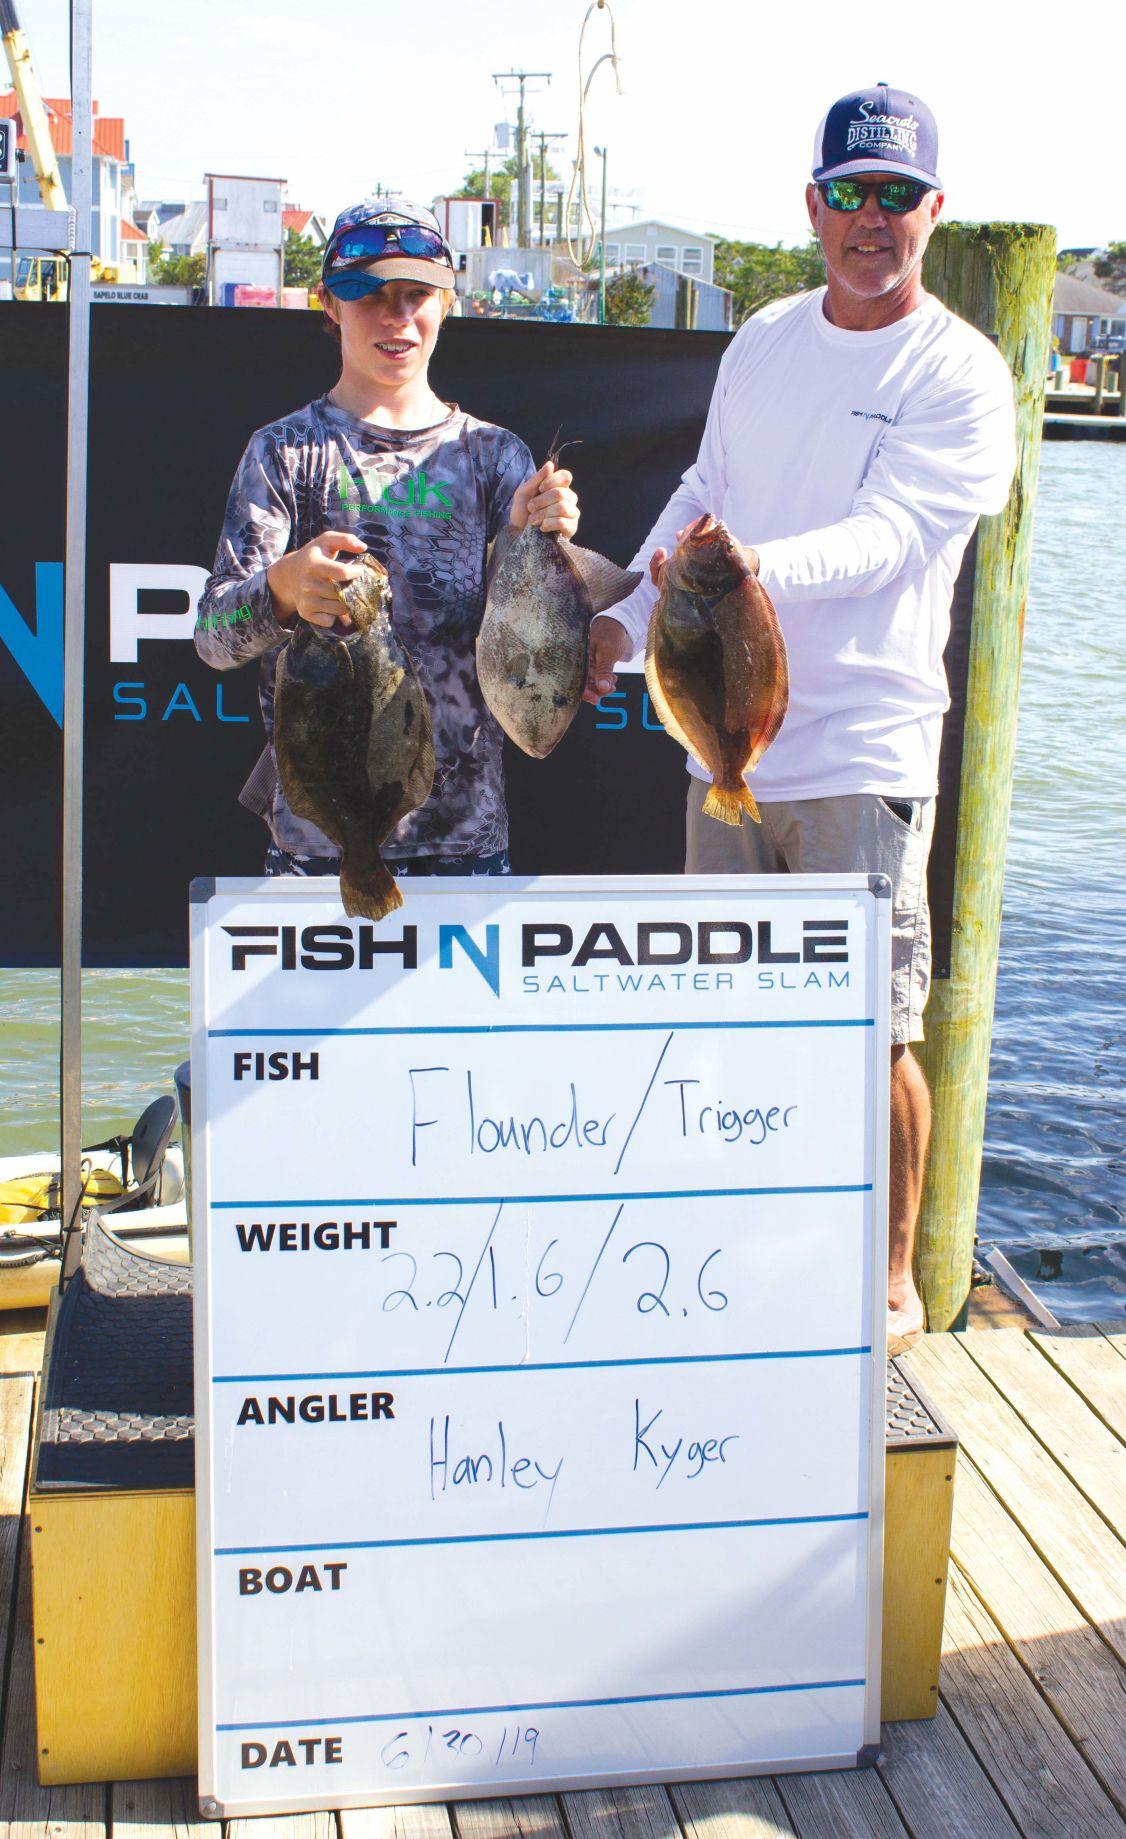 fish and paddle Hanley